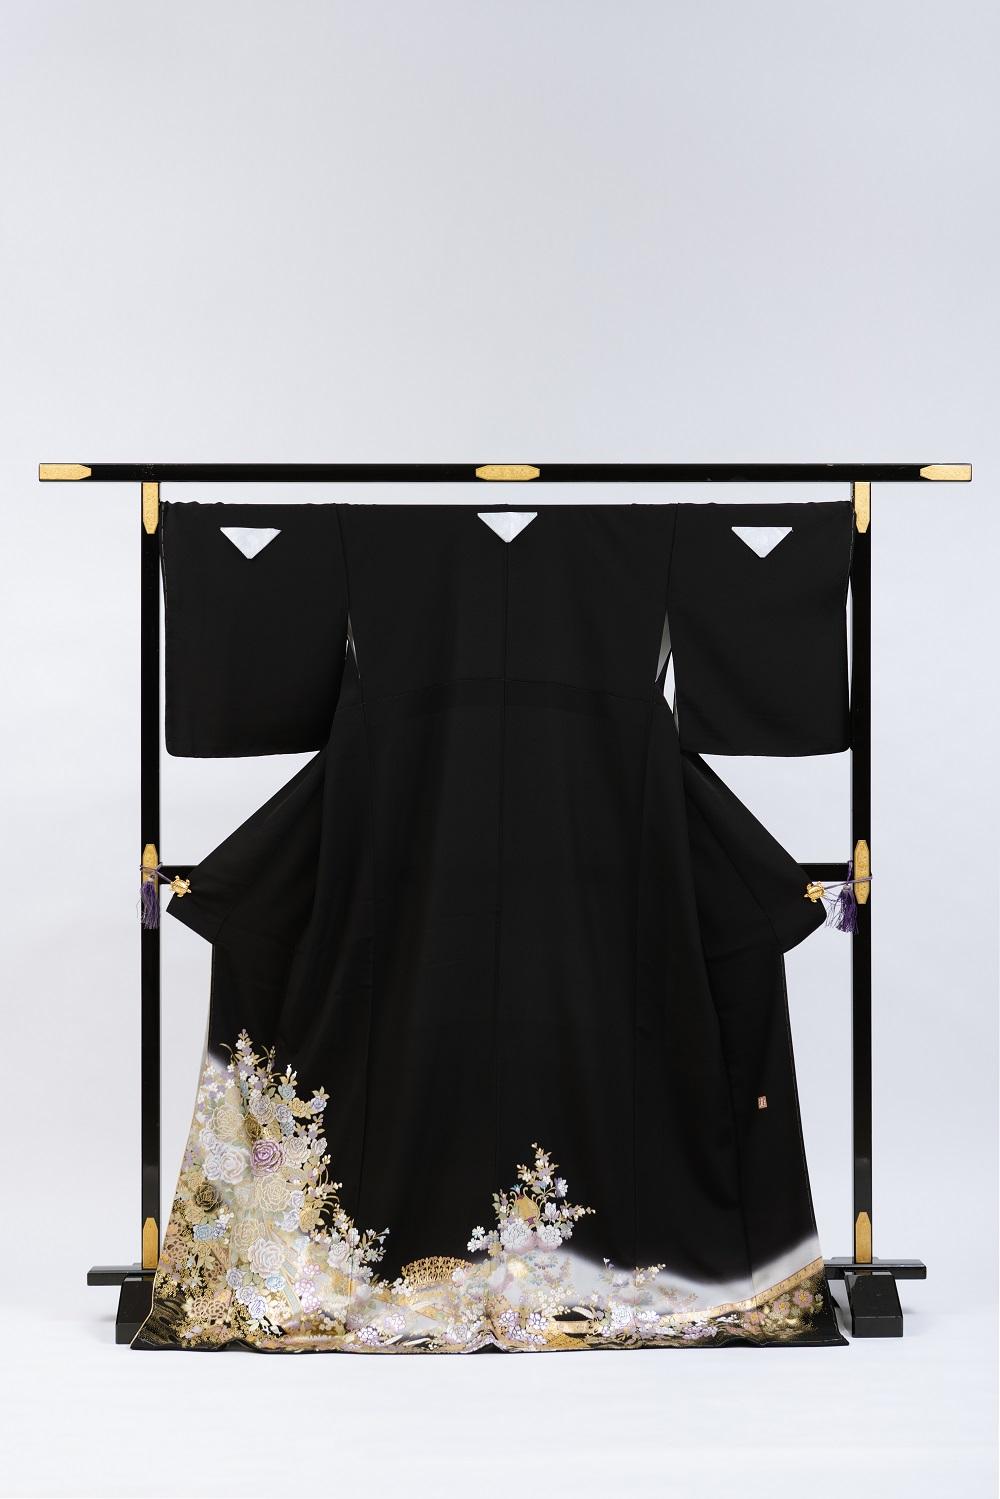 【Lサイズの桂由美留袖レンタル】yumi-katsura-28 桂由美ブランドの黒留袖レンタル パステル調 薔薇  Lサイズ